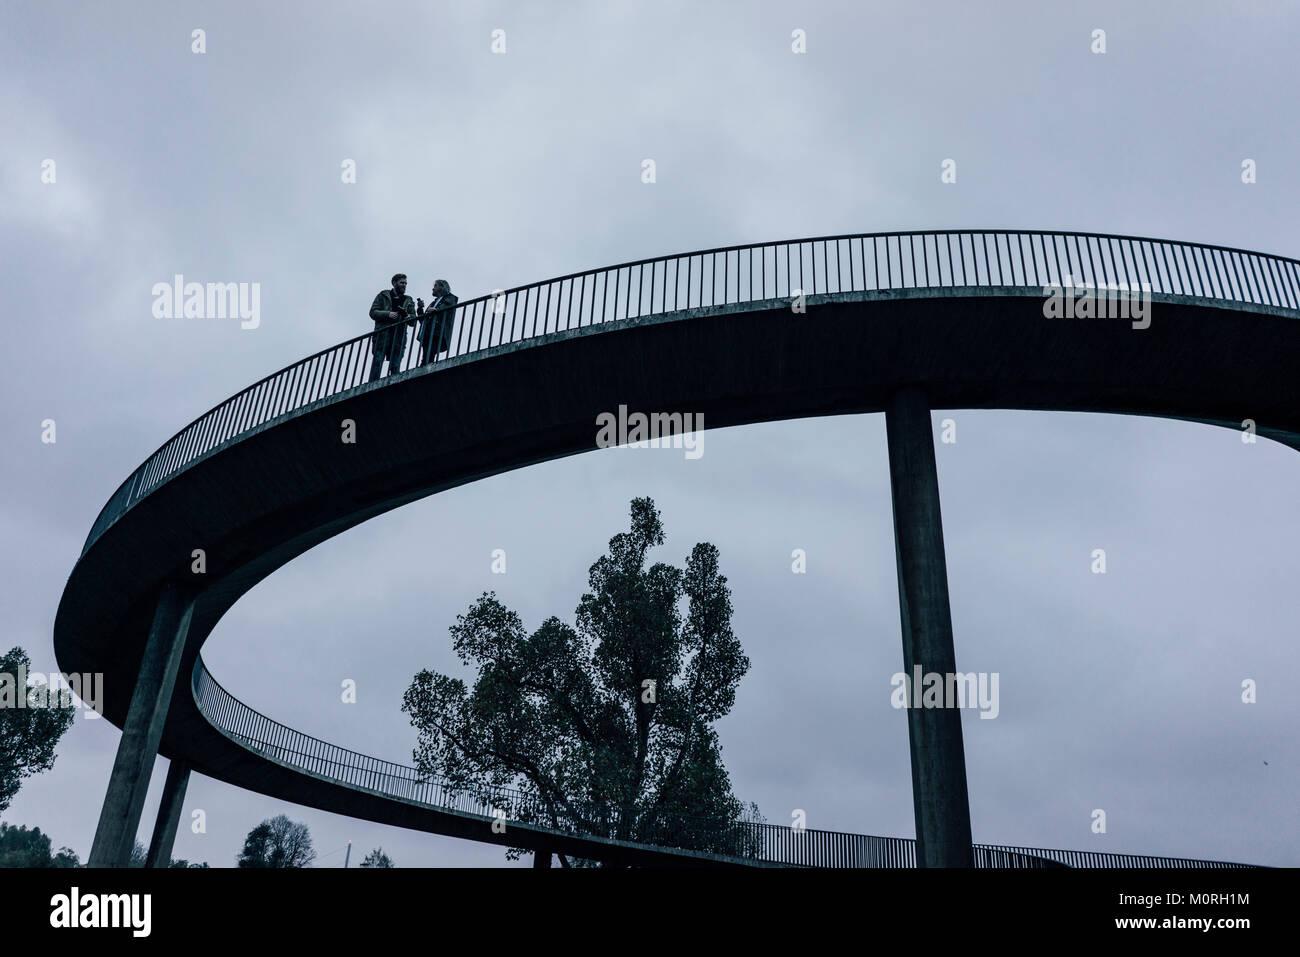 Two businessmen standing on dark bridge, having a meeting - Stock Image